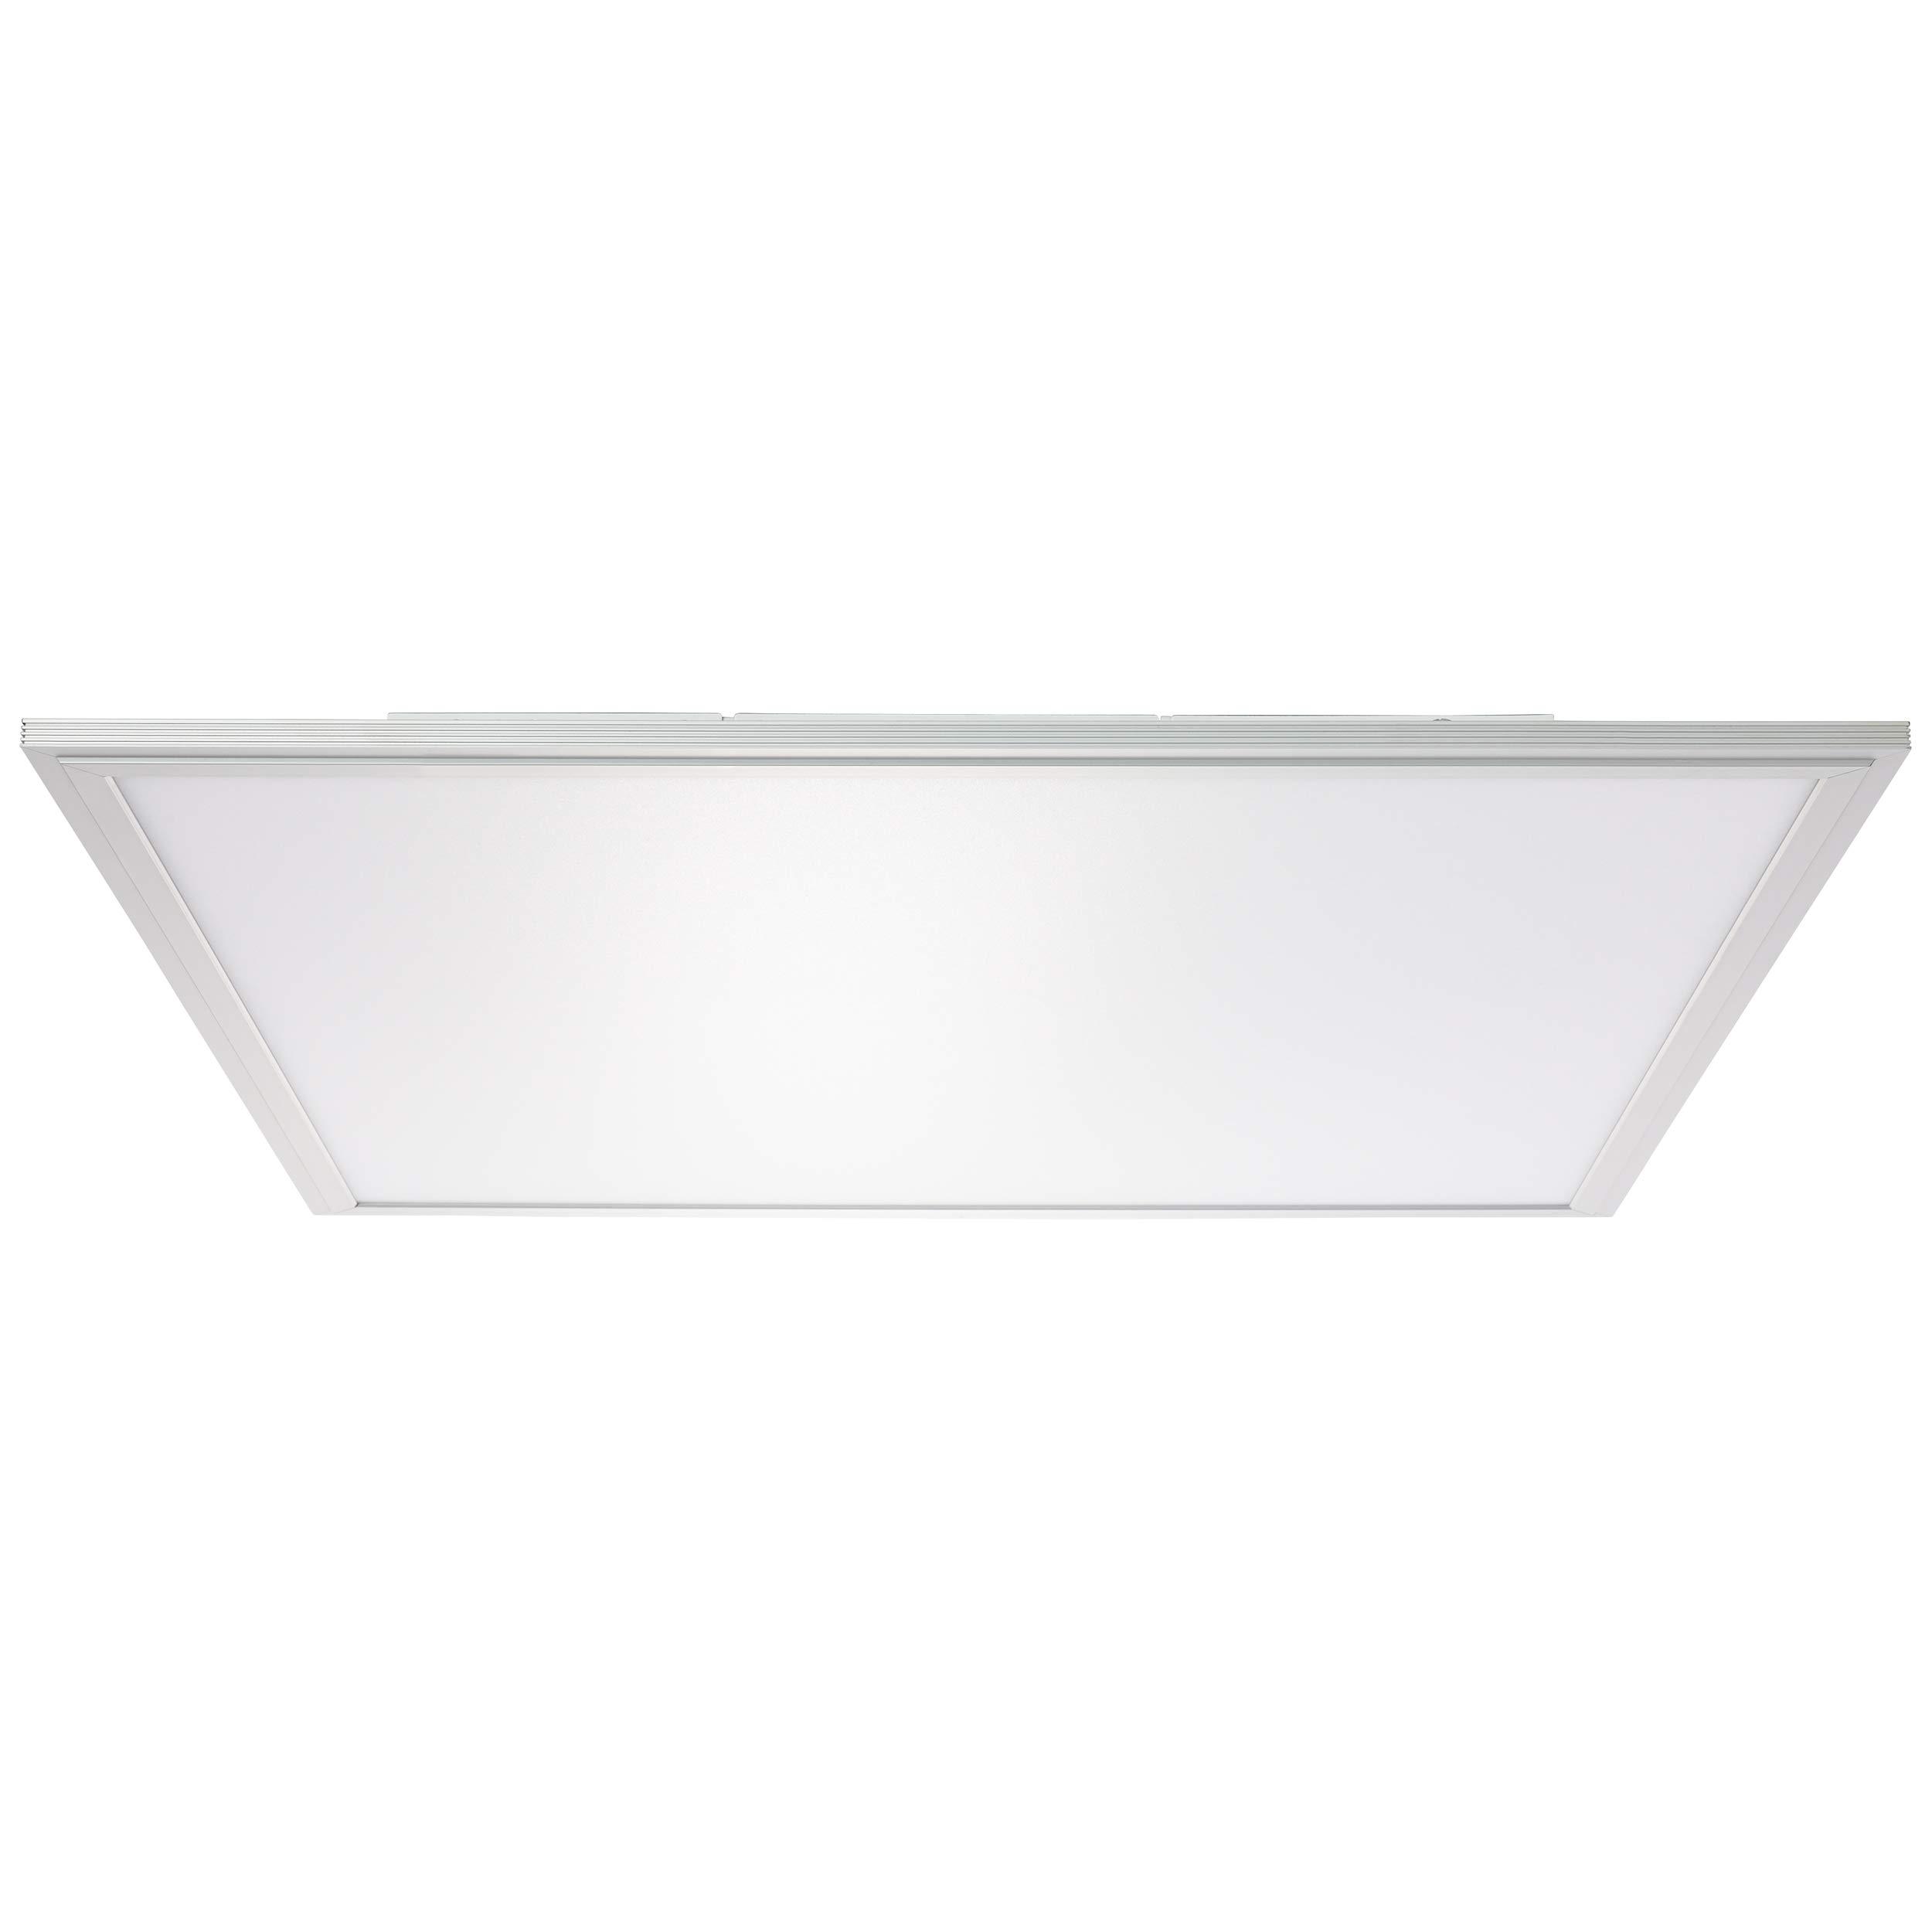 Bianco 55 W Philips Lighting Hue Aurelle Lampada da Soffitto LED Connessa Quadrata